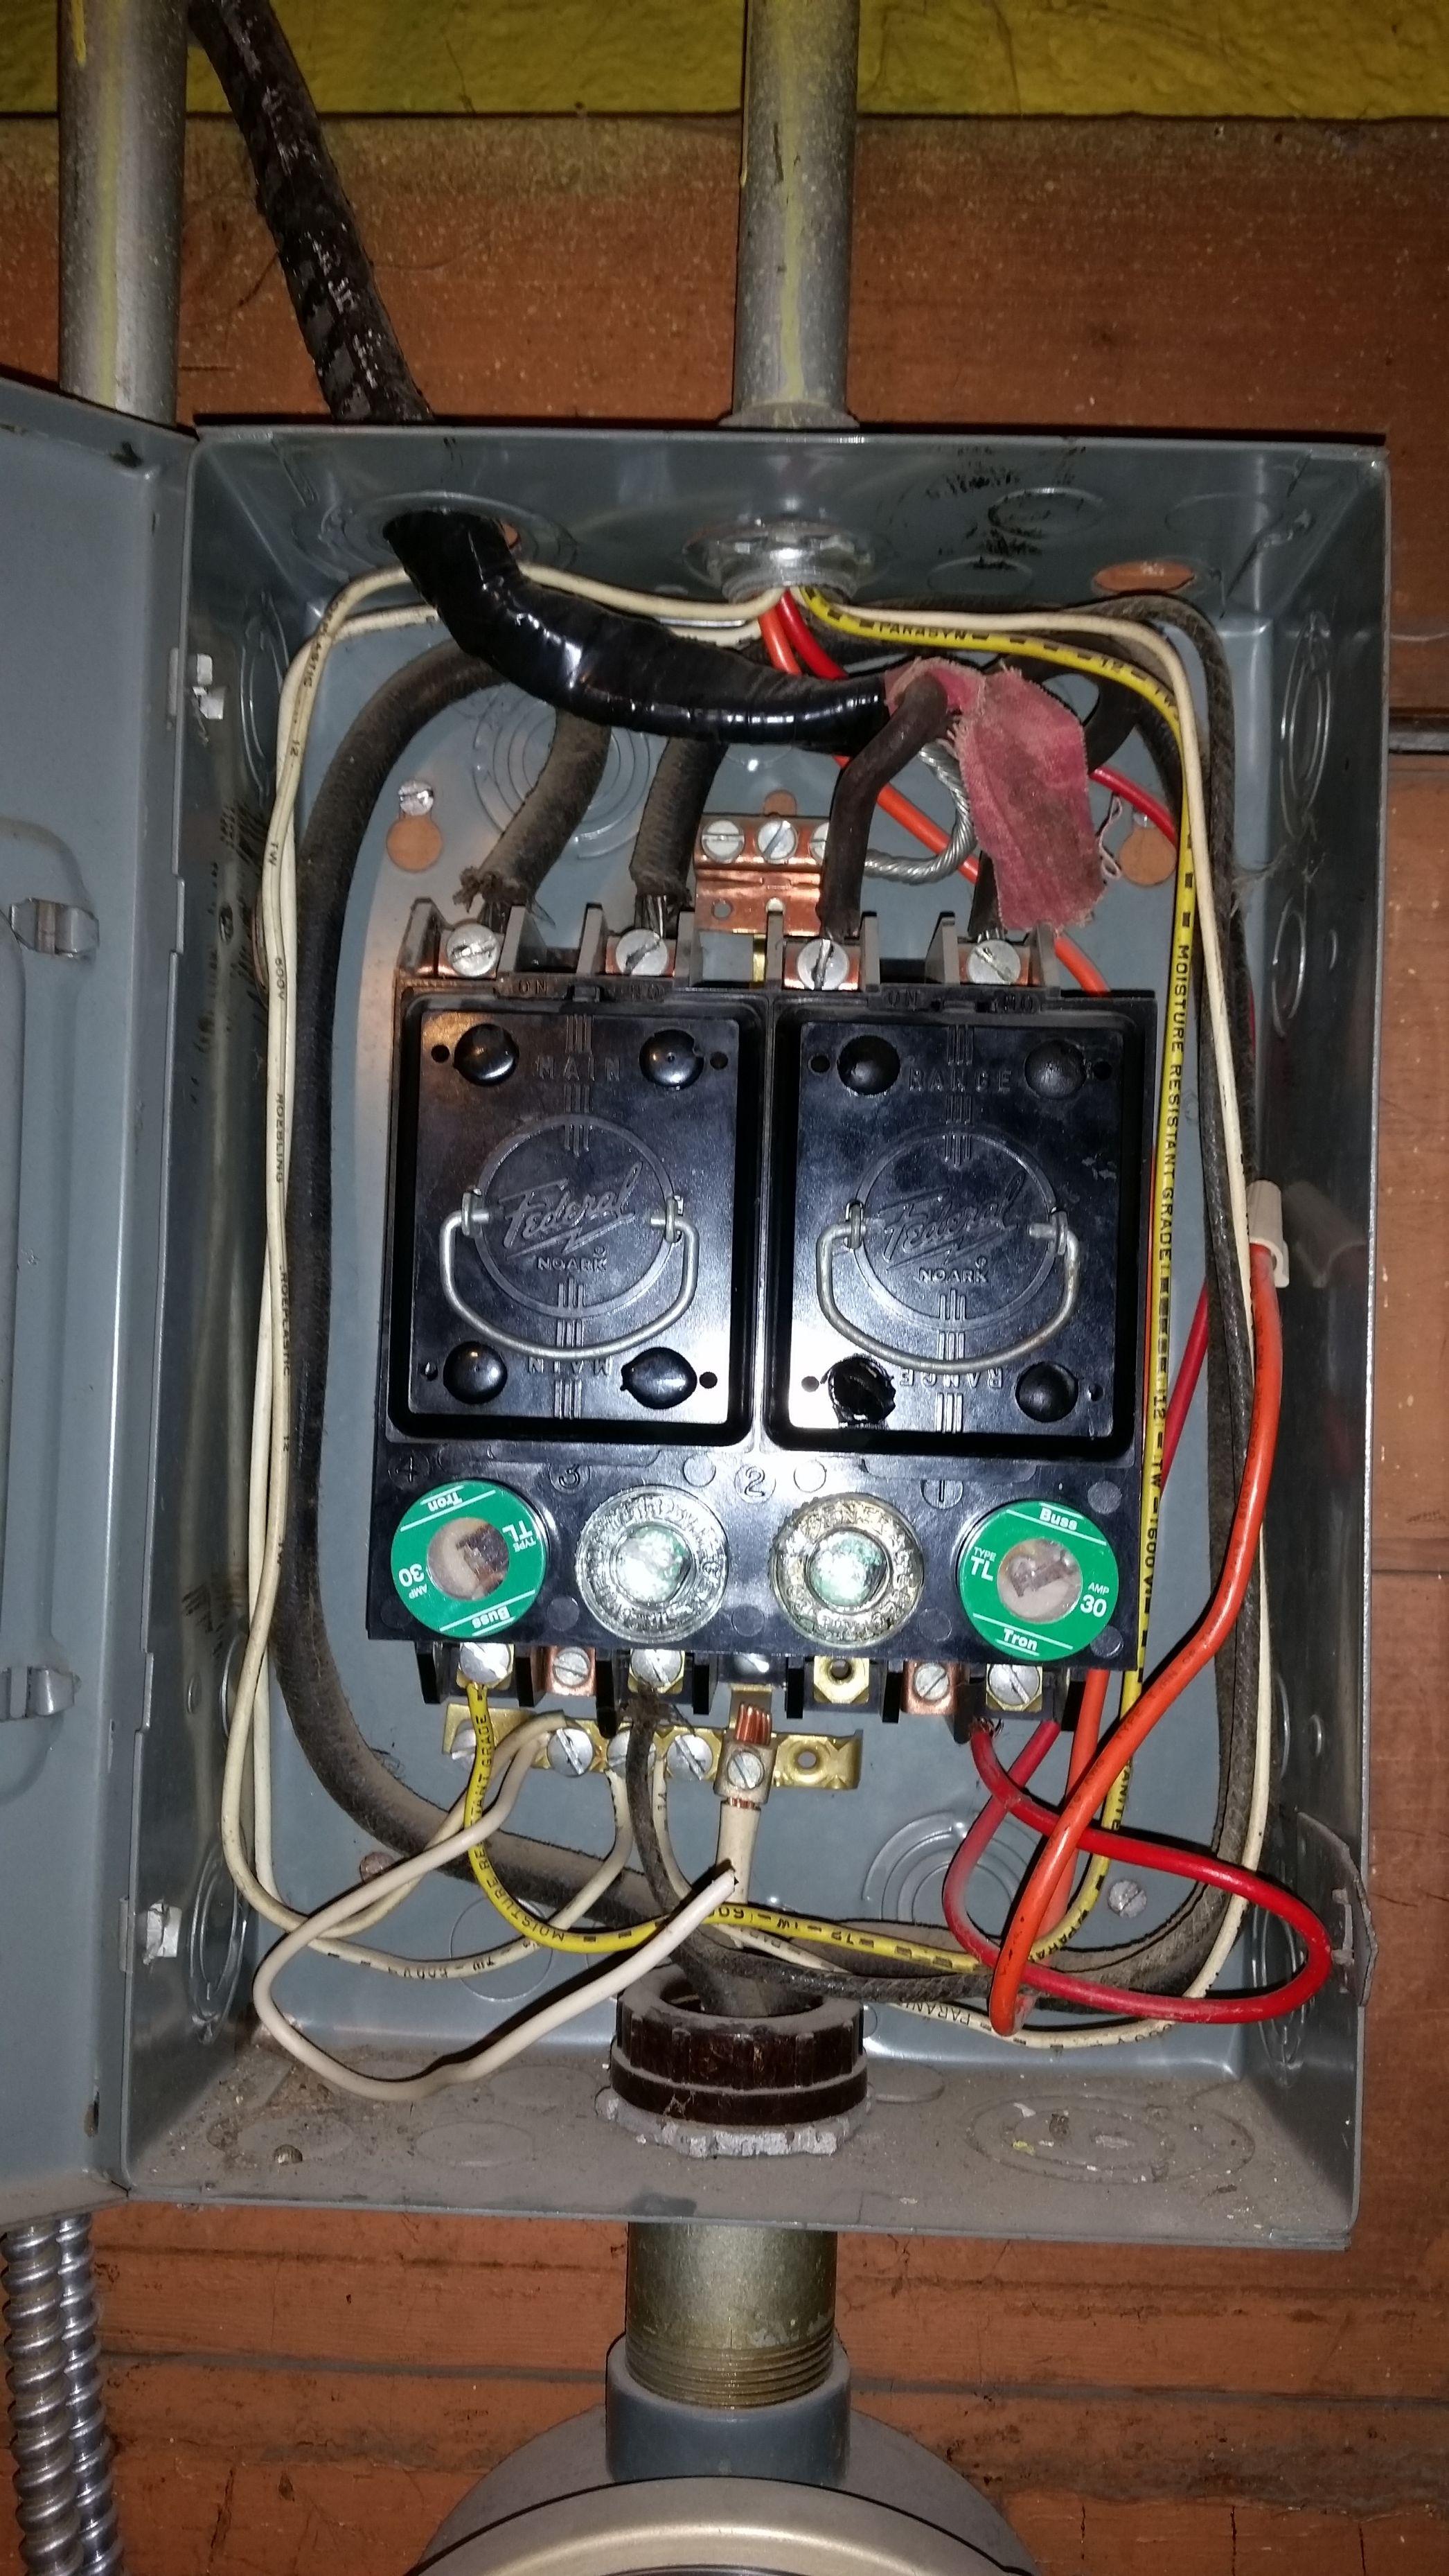 Home Fuse Box Wiring - Data Wiring Diagram Schematic - Breaker Box Wiring Diagram